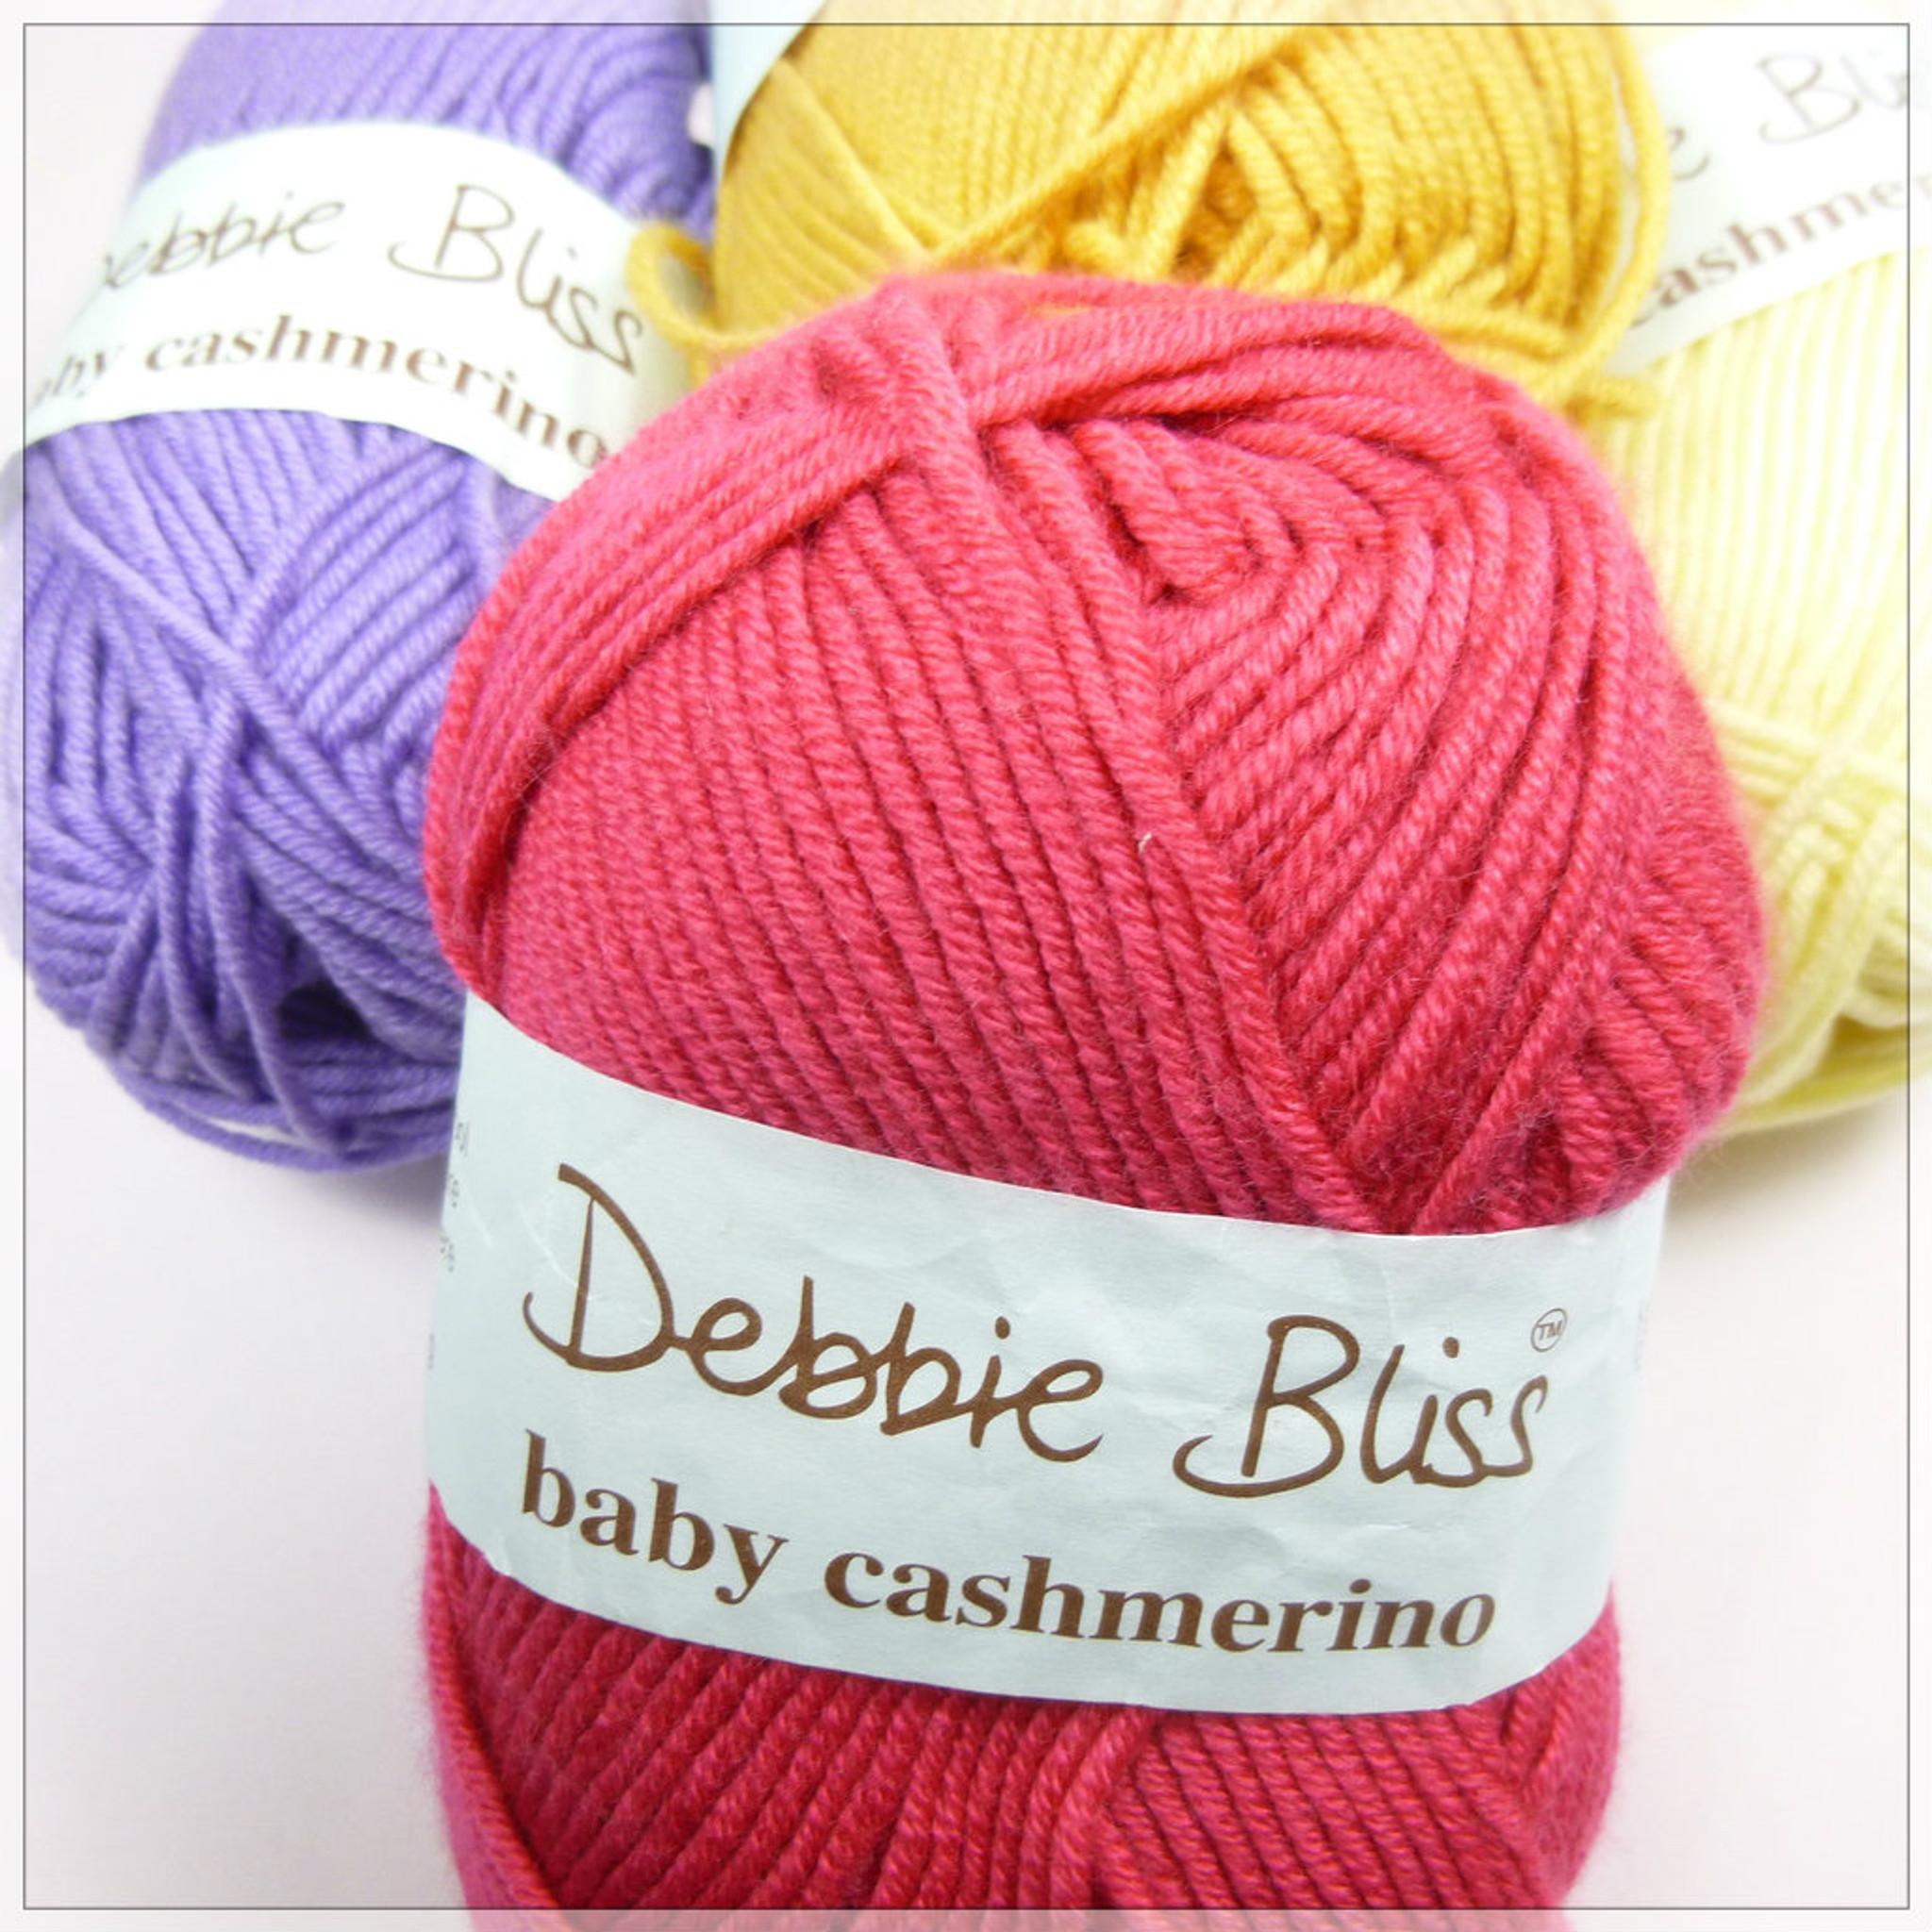 DEBBIE BLISS BABY CASHMERINO WOOL 306 flame